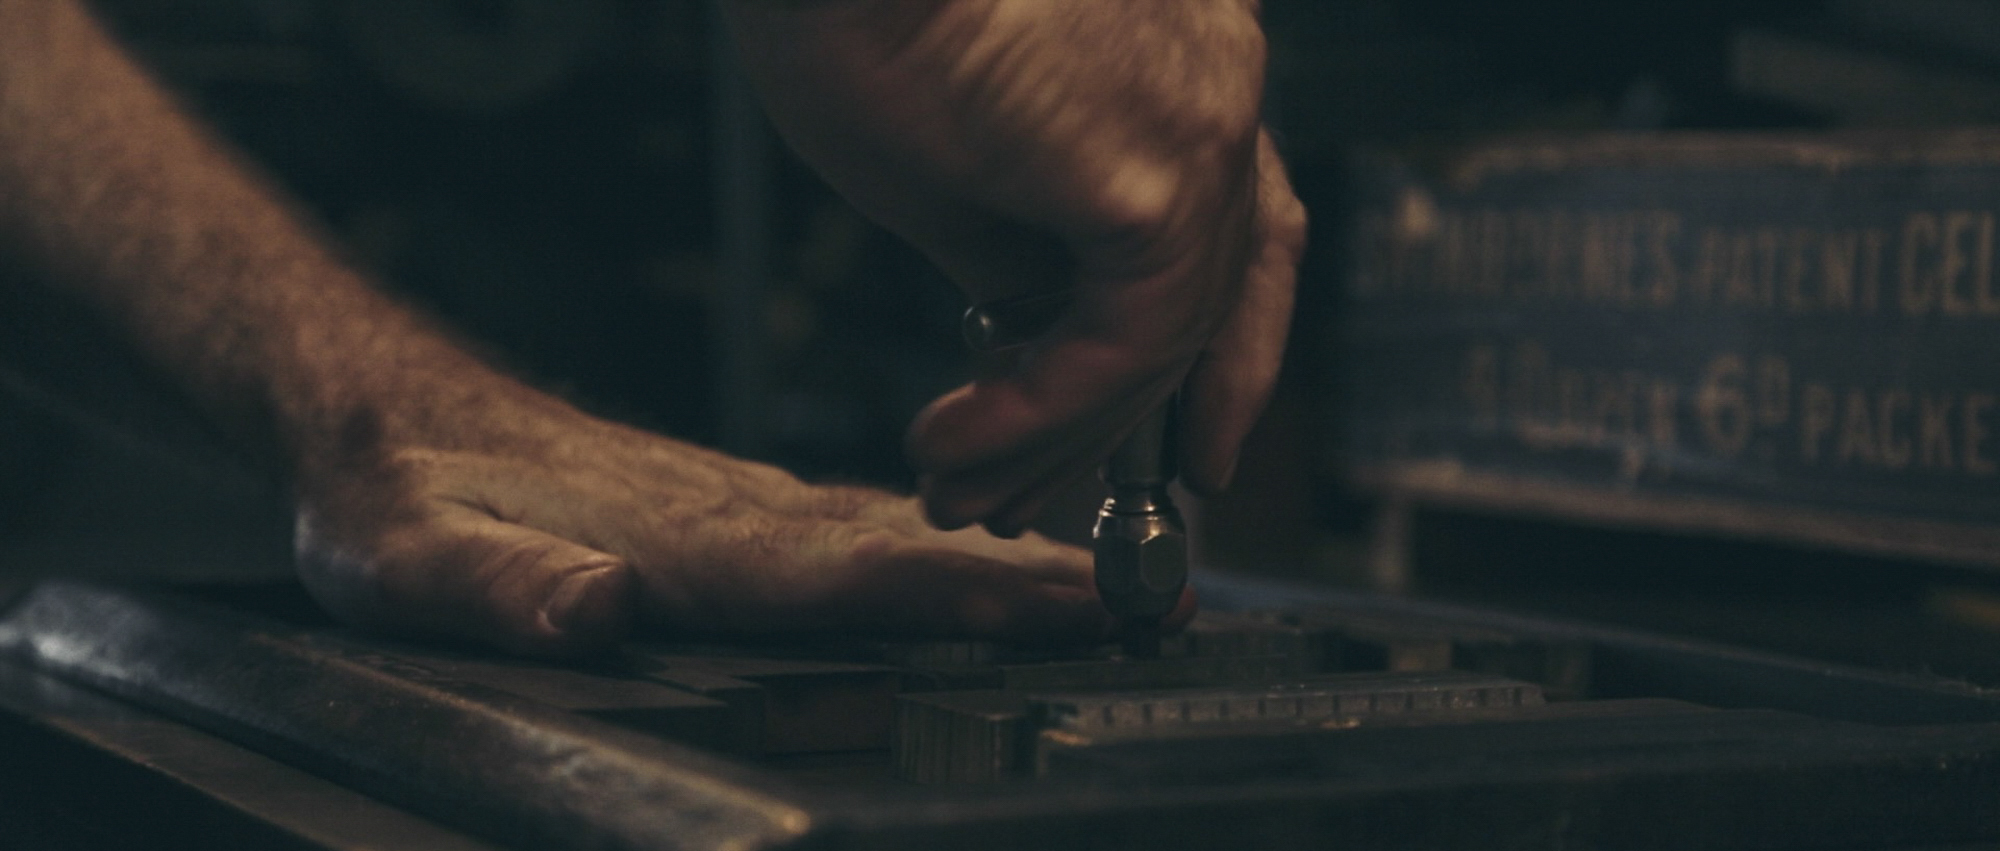 Pressed letters frame 5_screw hands.jpg